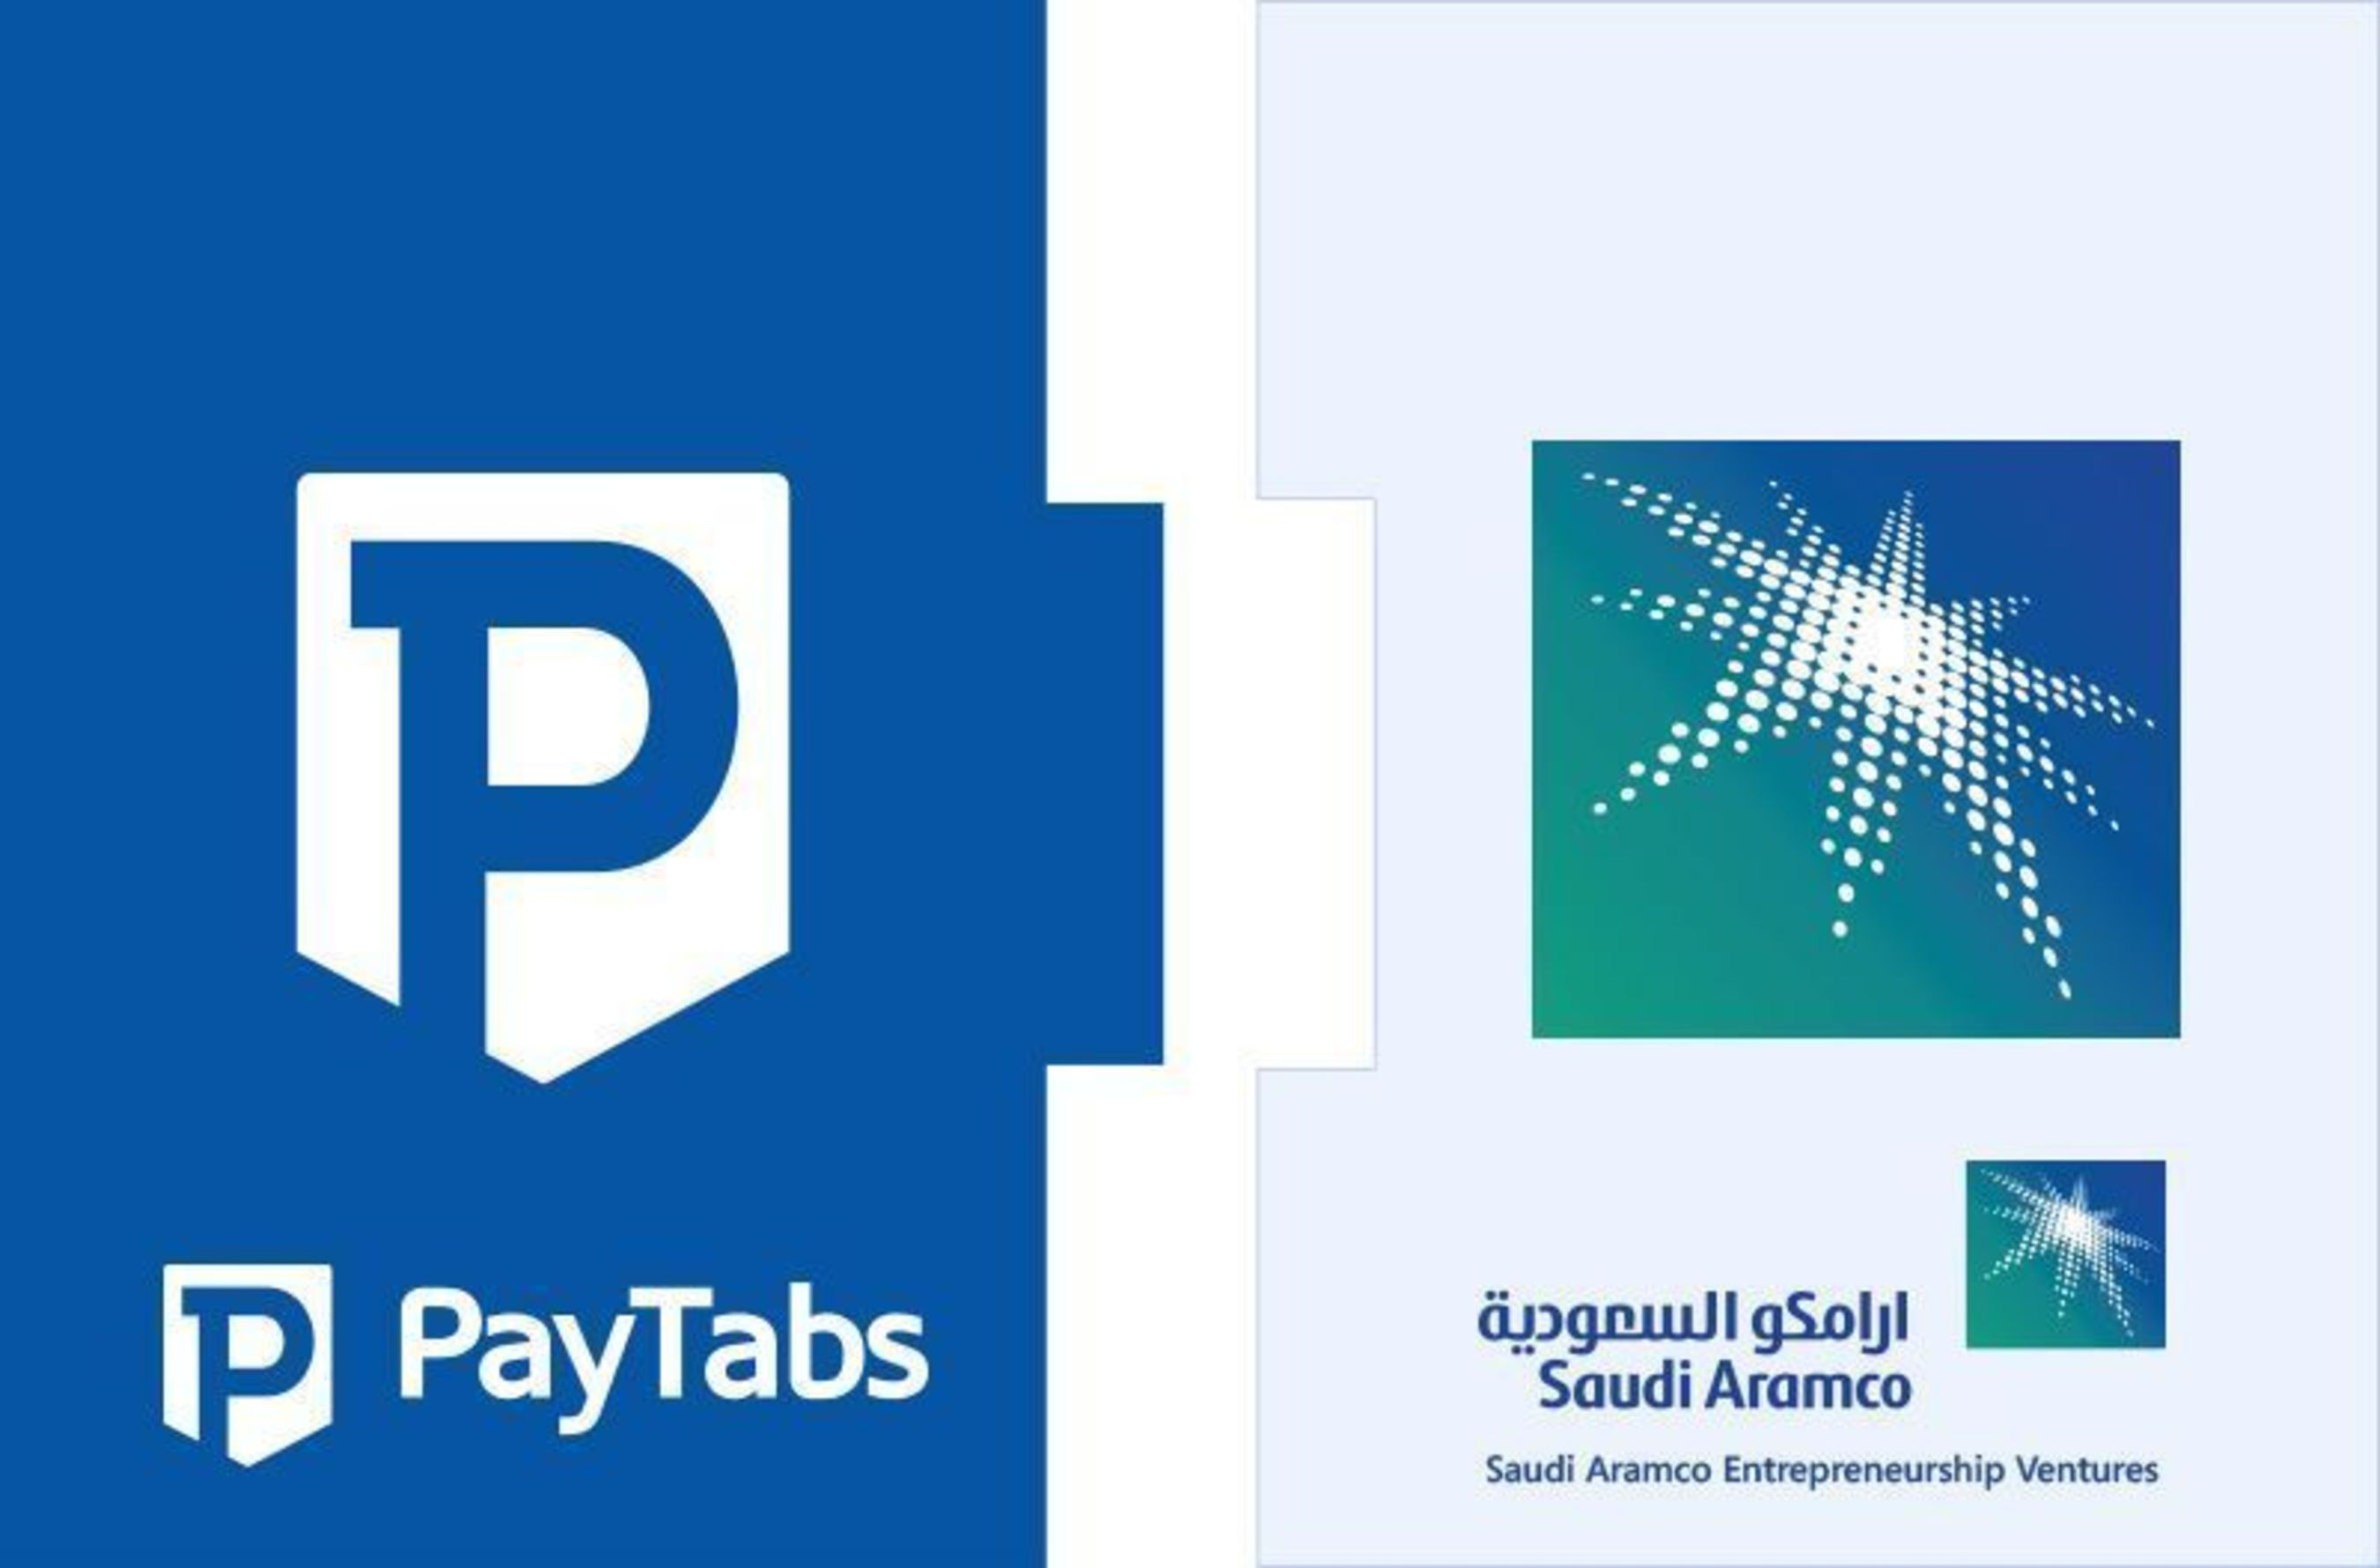 Saudi Aramco Entrepreneurship venture invests in PayTabs (PRNewsFoto/PayTabs LLC Holding Company)